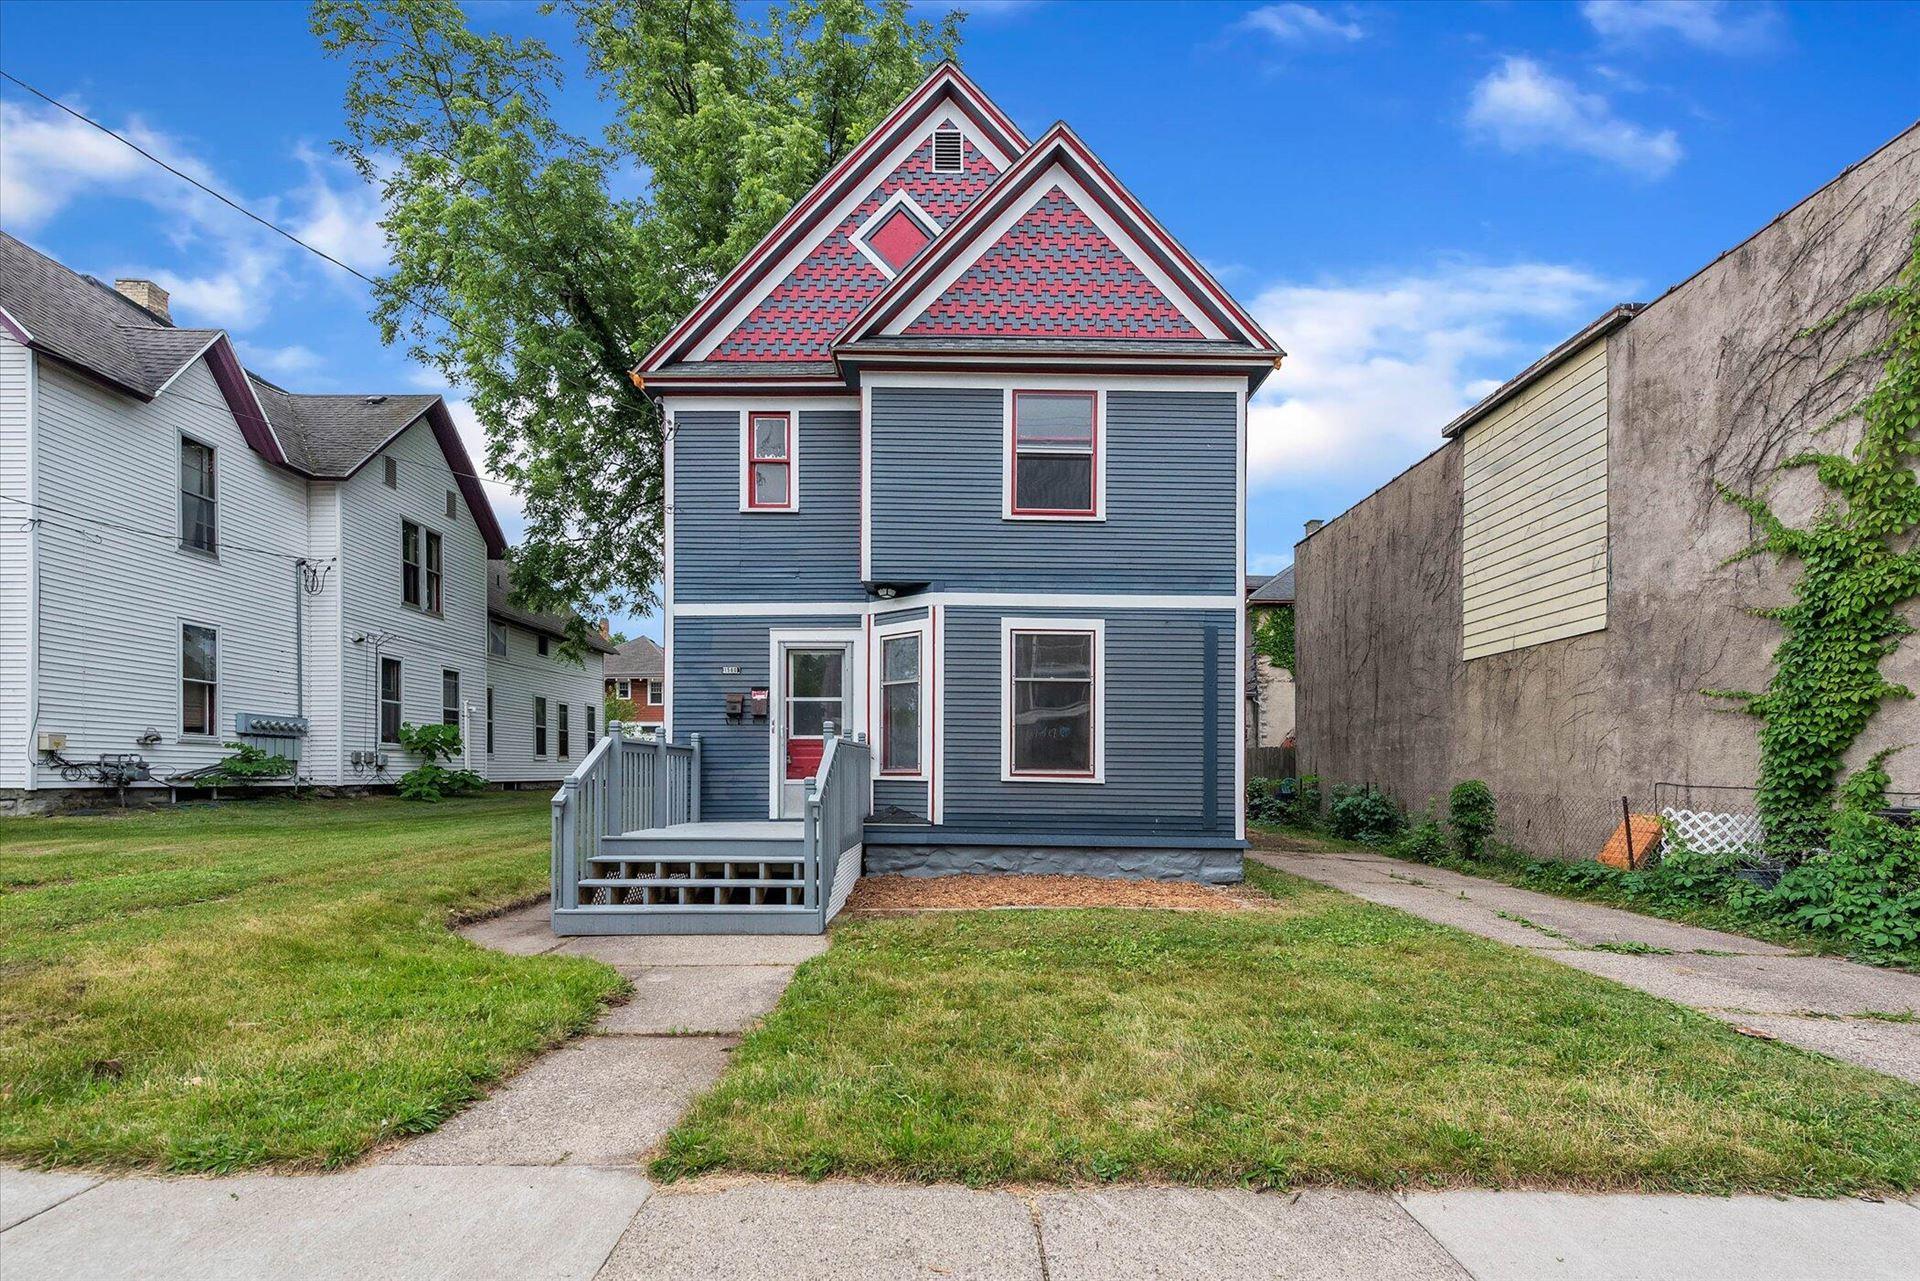 1560 Wealthy Street SE, Grand Rapids, MI 49506 - MLS#: 21024331